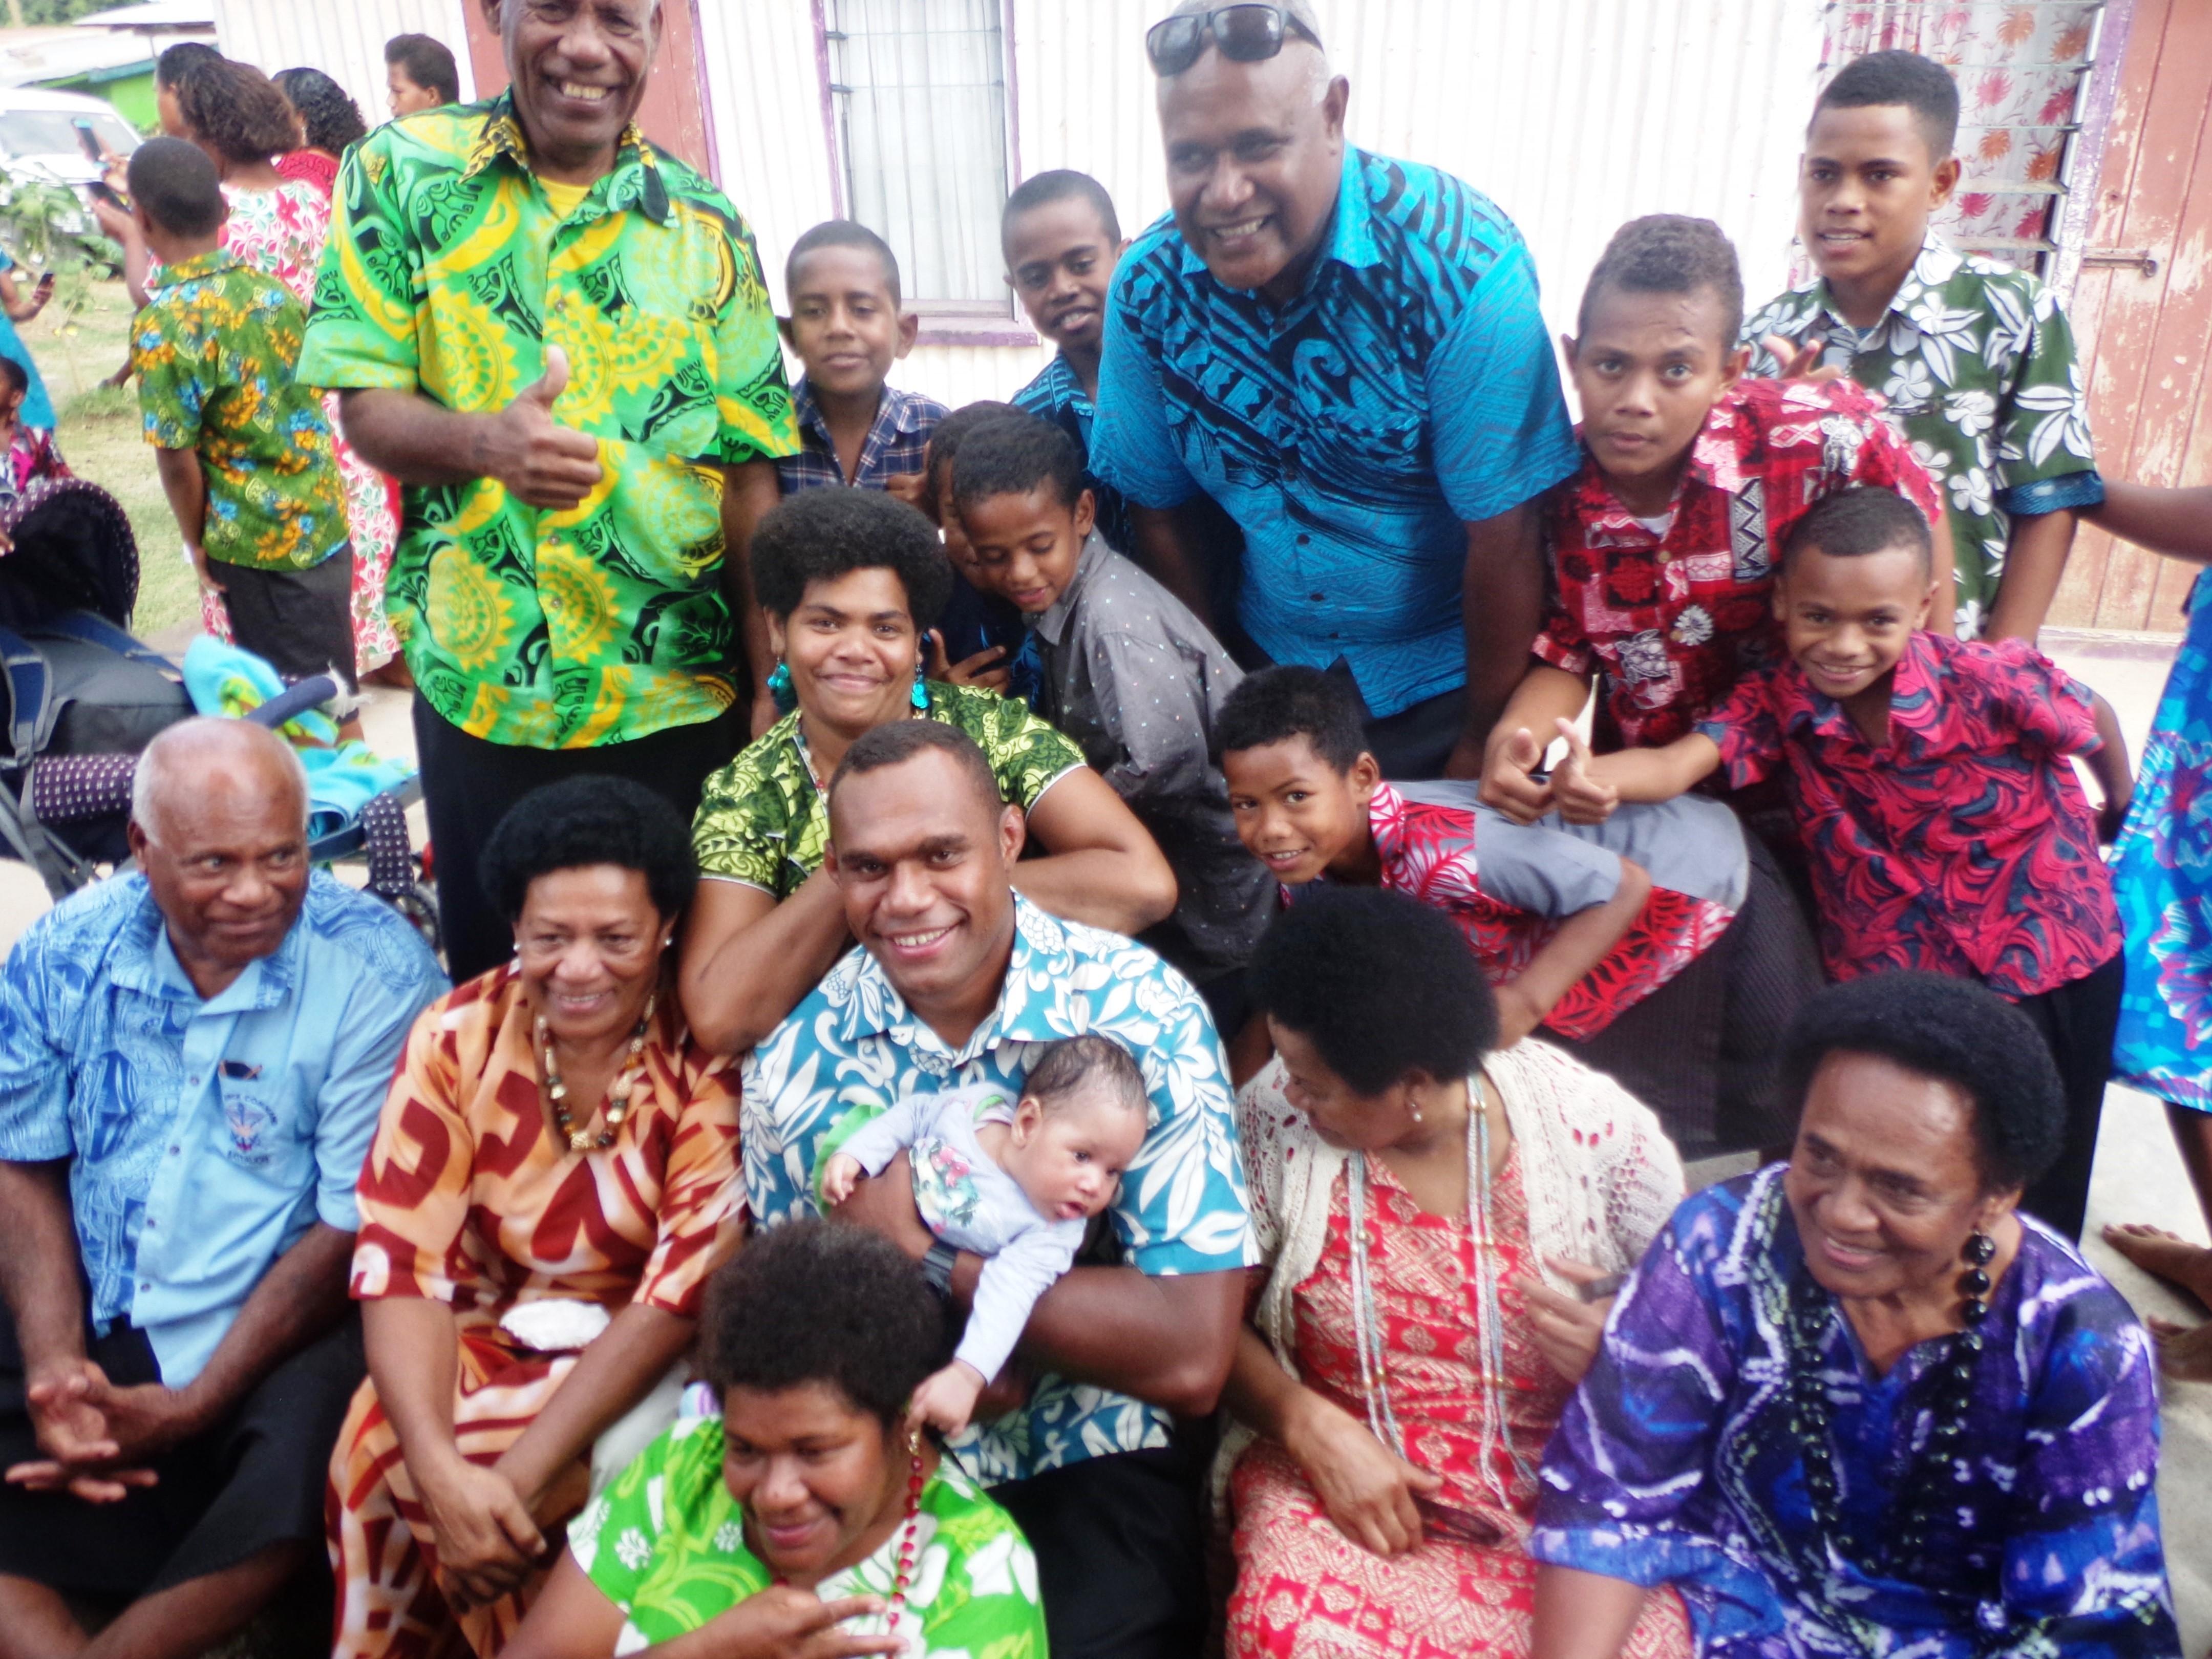 Fiji Airways Flying Fijians lock Leone Nakarawa is flanked by fans at Votua Village in Ba, on June 29, 2018. Photo: Peni Komaisavai